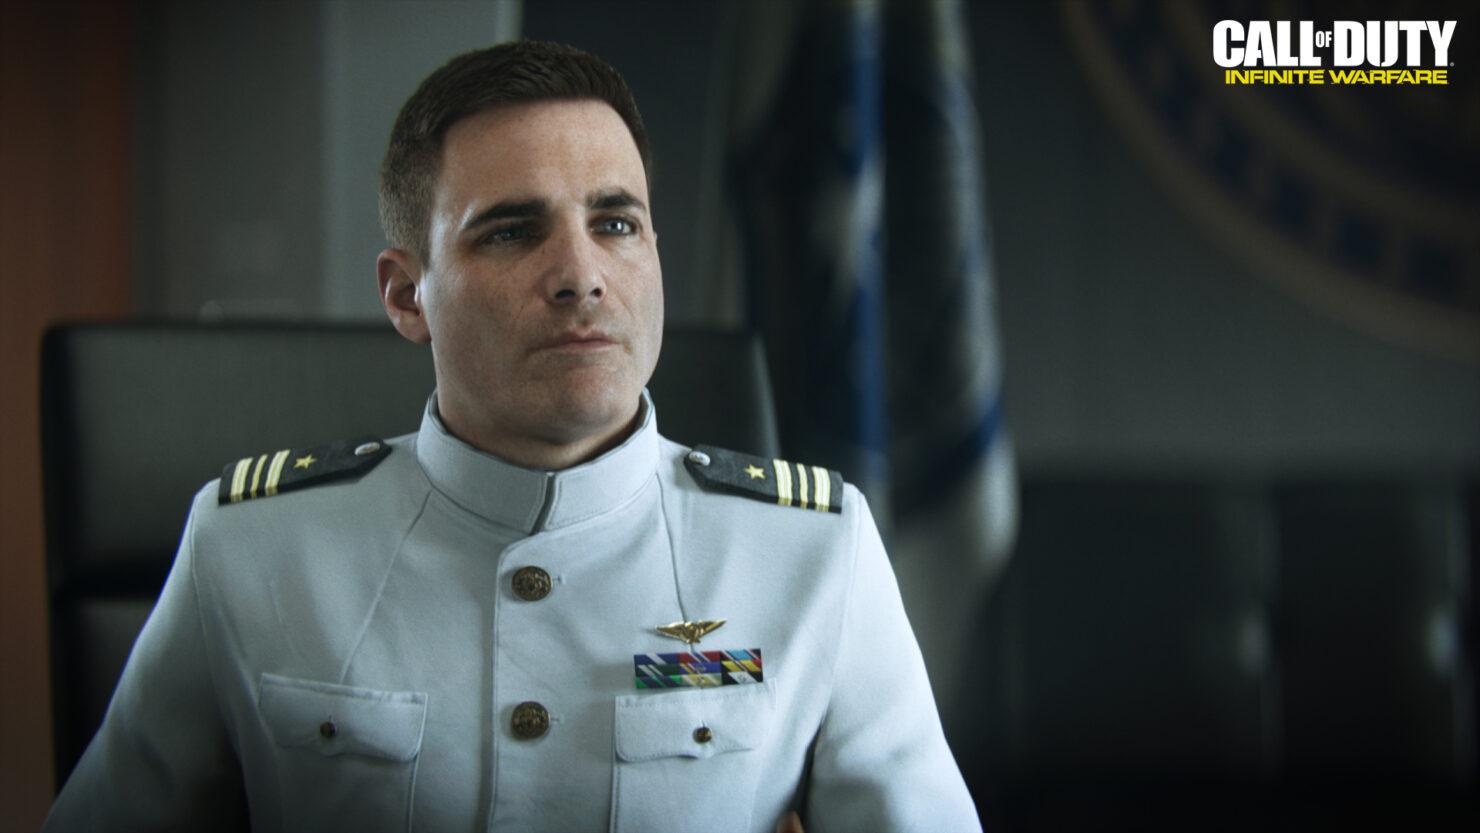 call_of_duty_infinite_warfare_captain_reyes_wm_1462201122